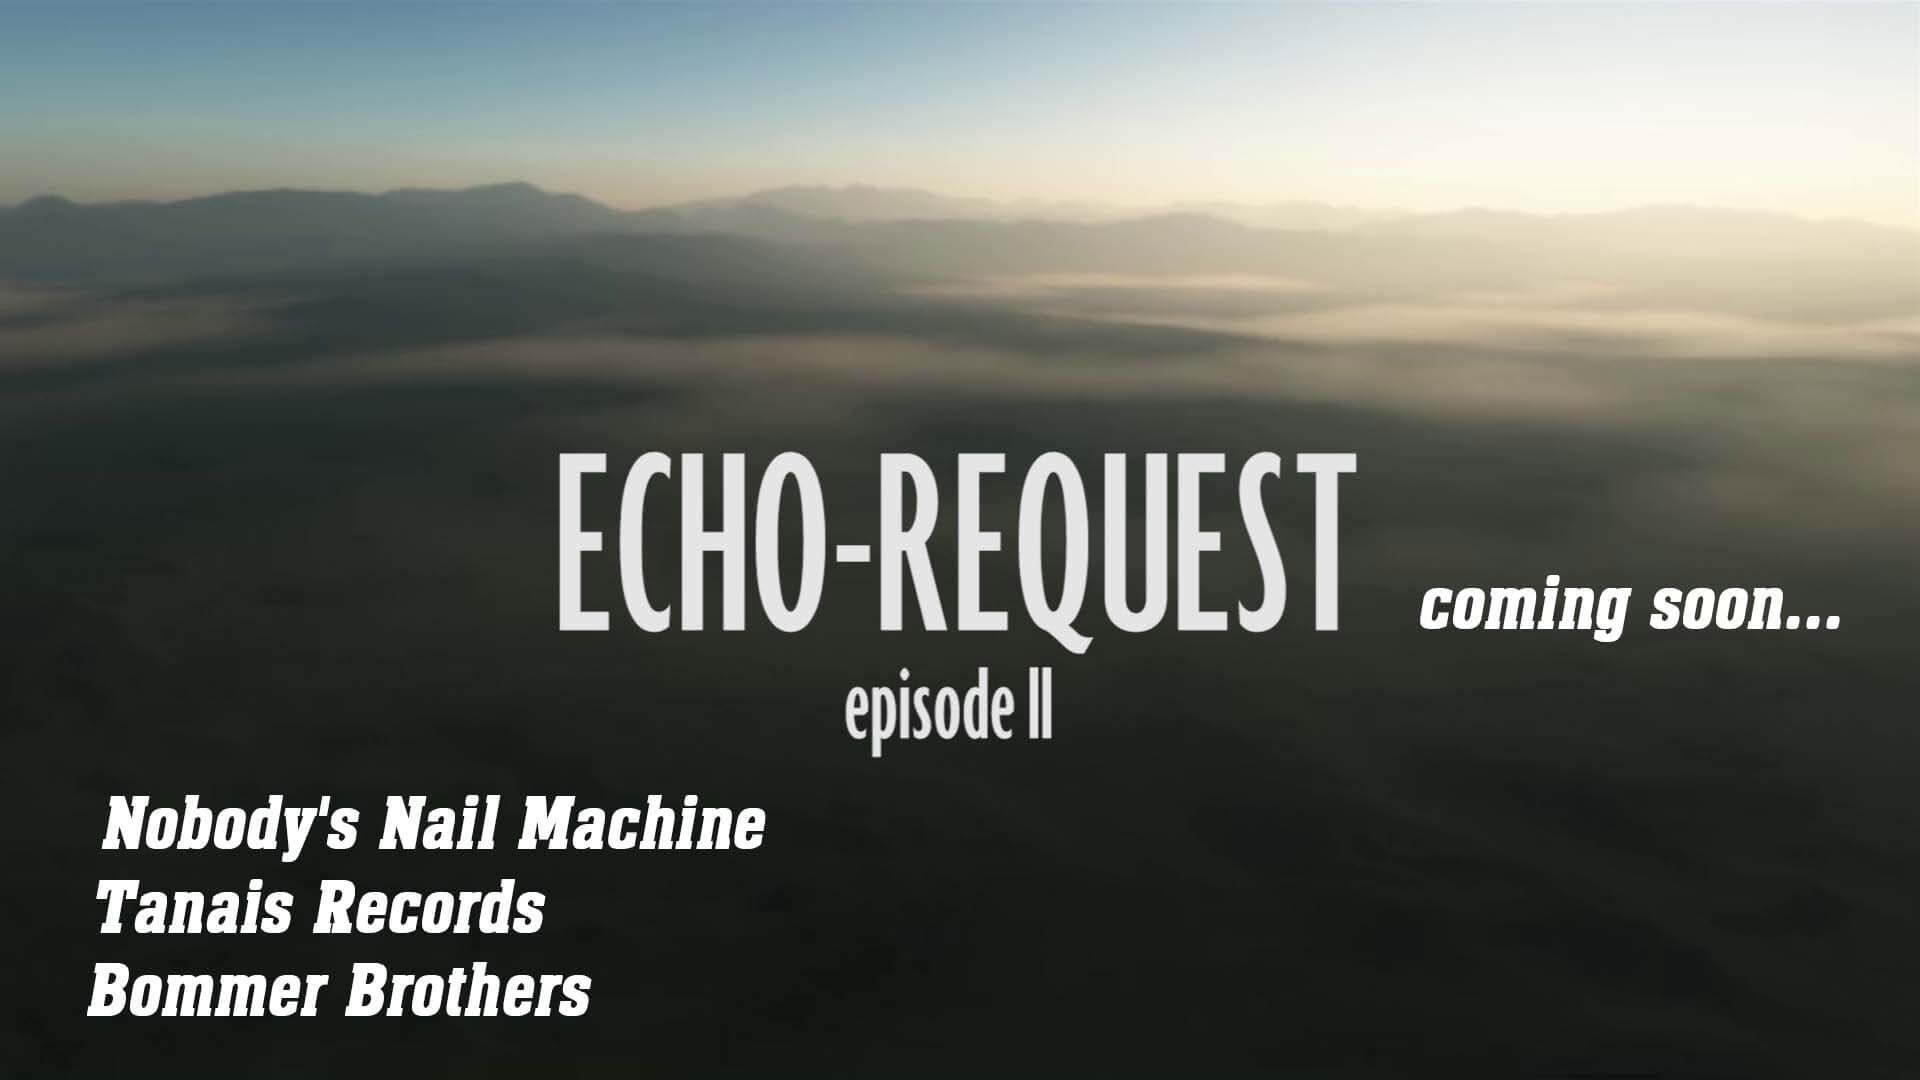 echo request trailer 2 - Uncategorized